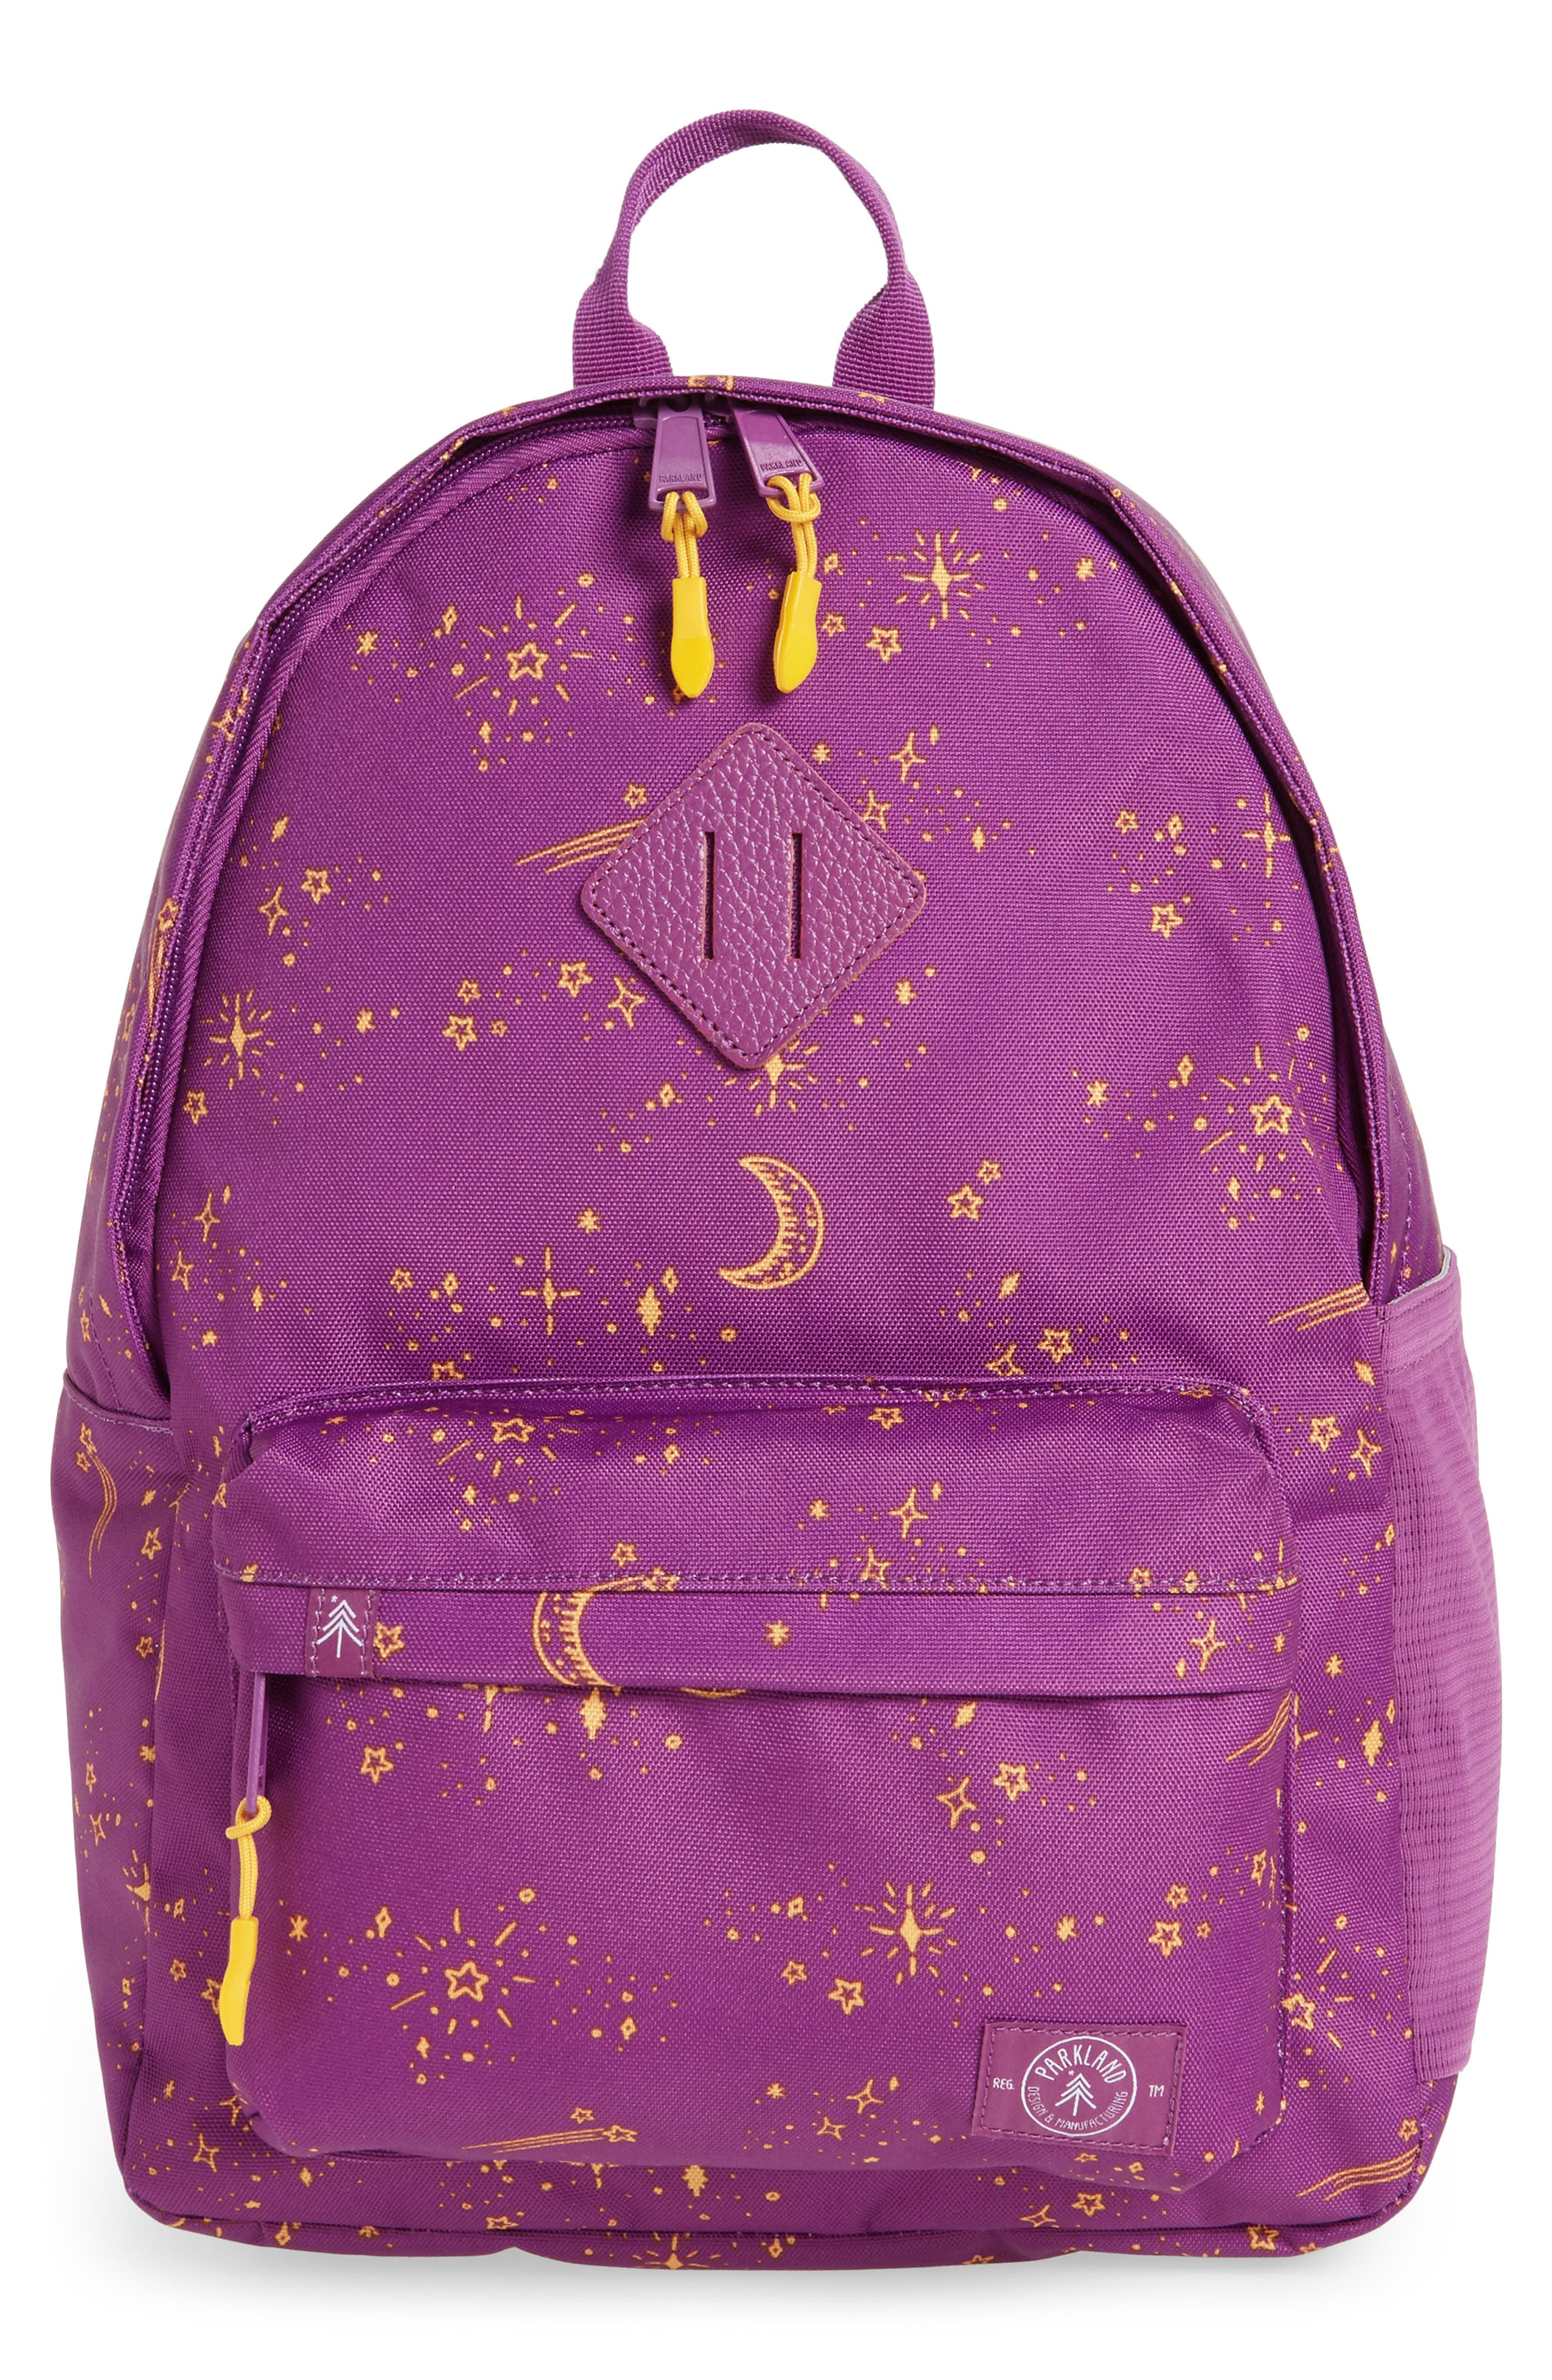 Alternate Image 1 Selected - Parkland Bayside - Sweet Dreams Backpack (Kids)